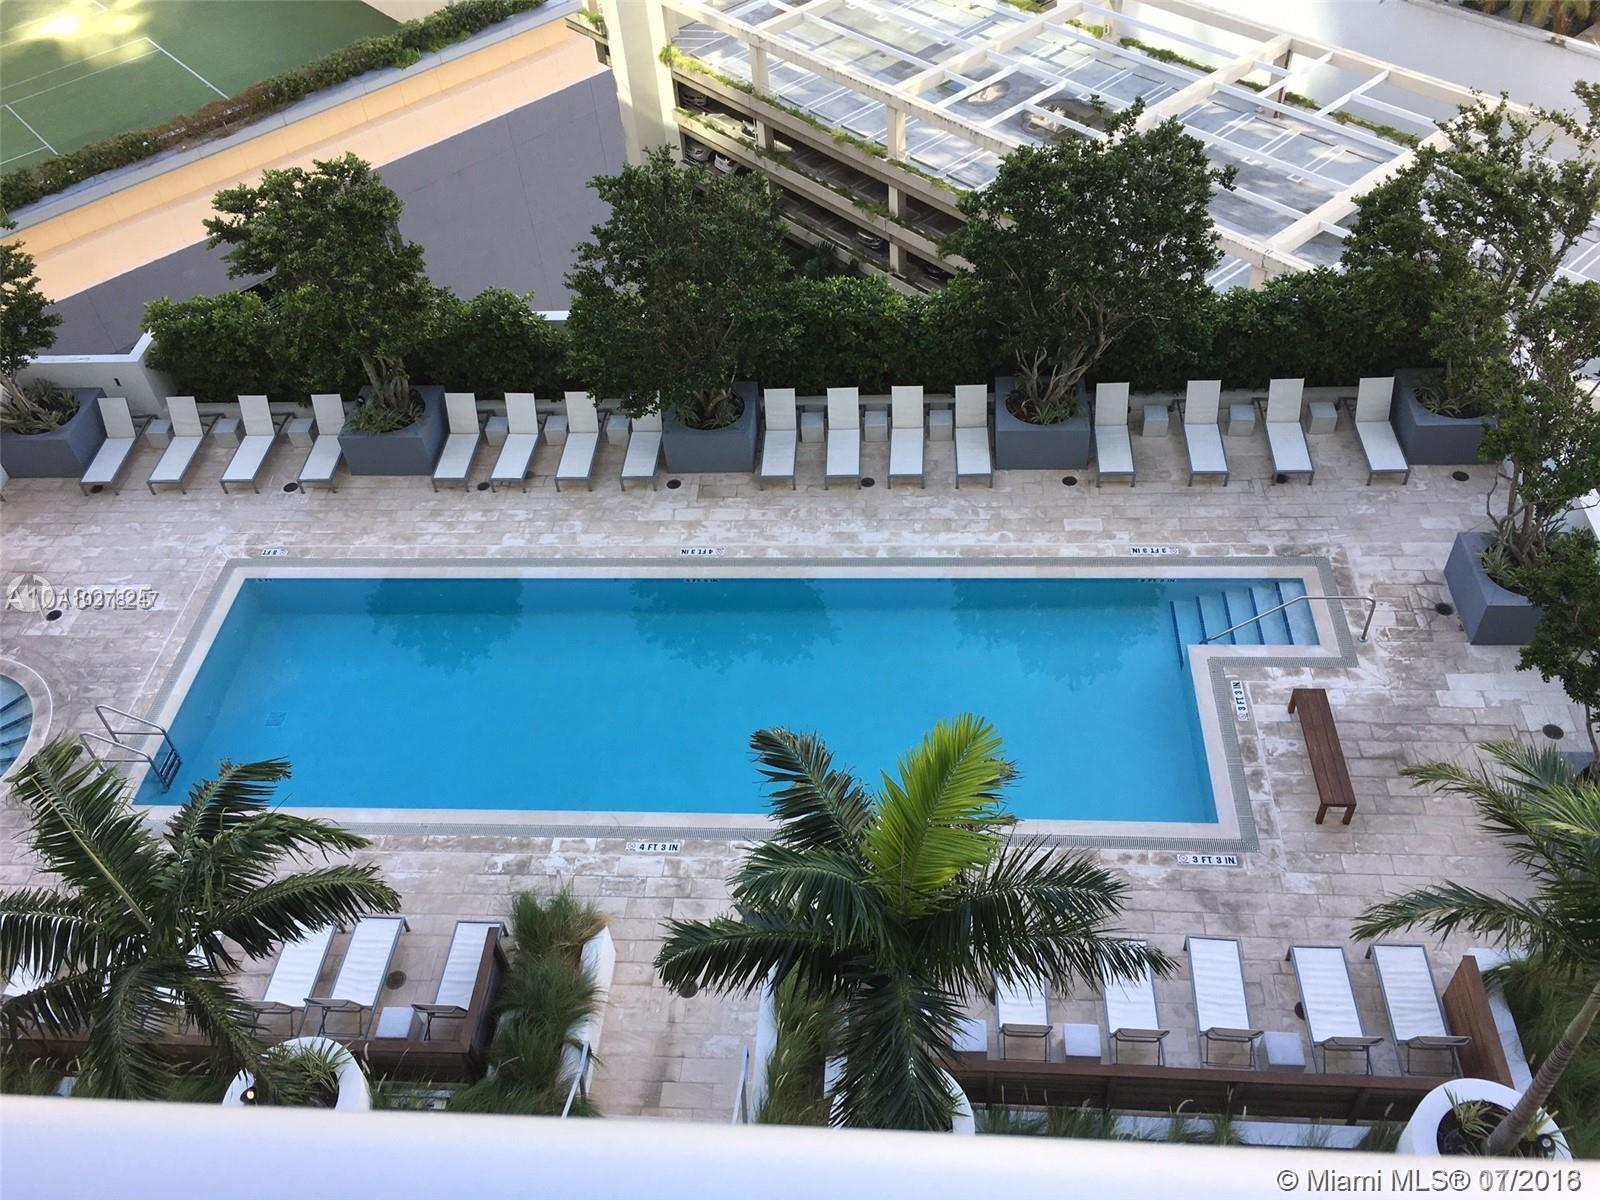 1300 Brickell Bay Drive, Miami, FL 33131, Brickell House #2408, Brickell, Miami A10278247 image #2